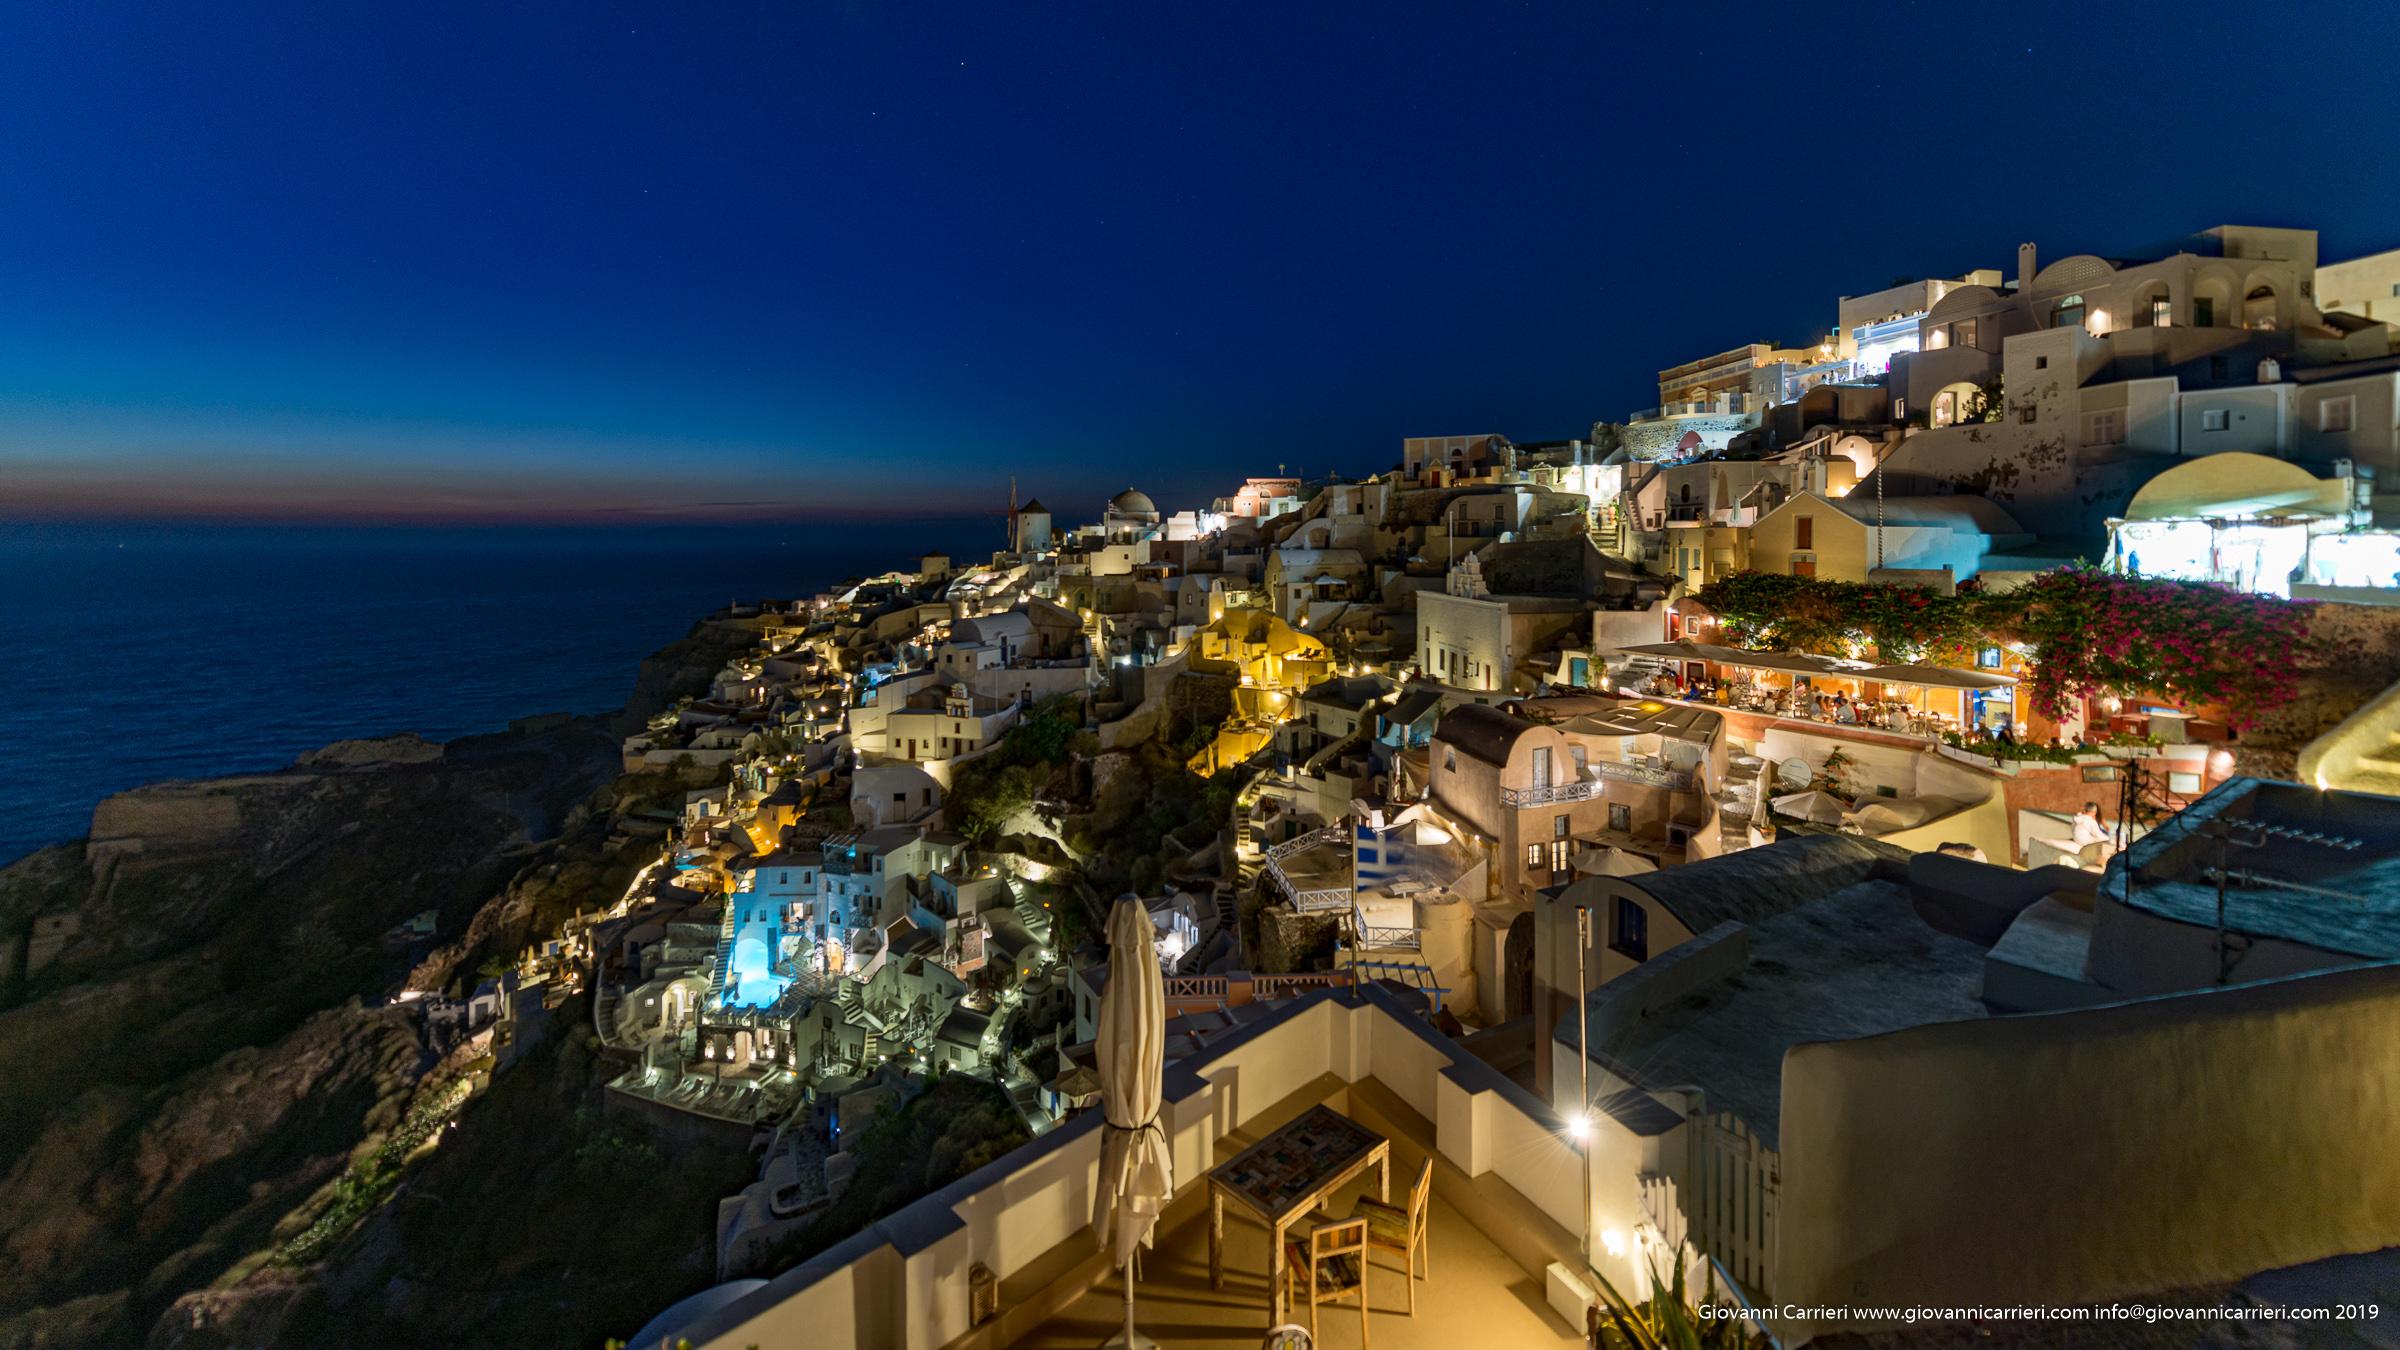 Vista notturna su Oia - Santorini